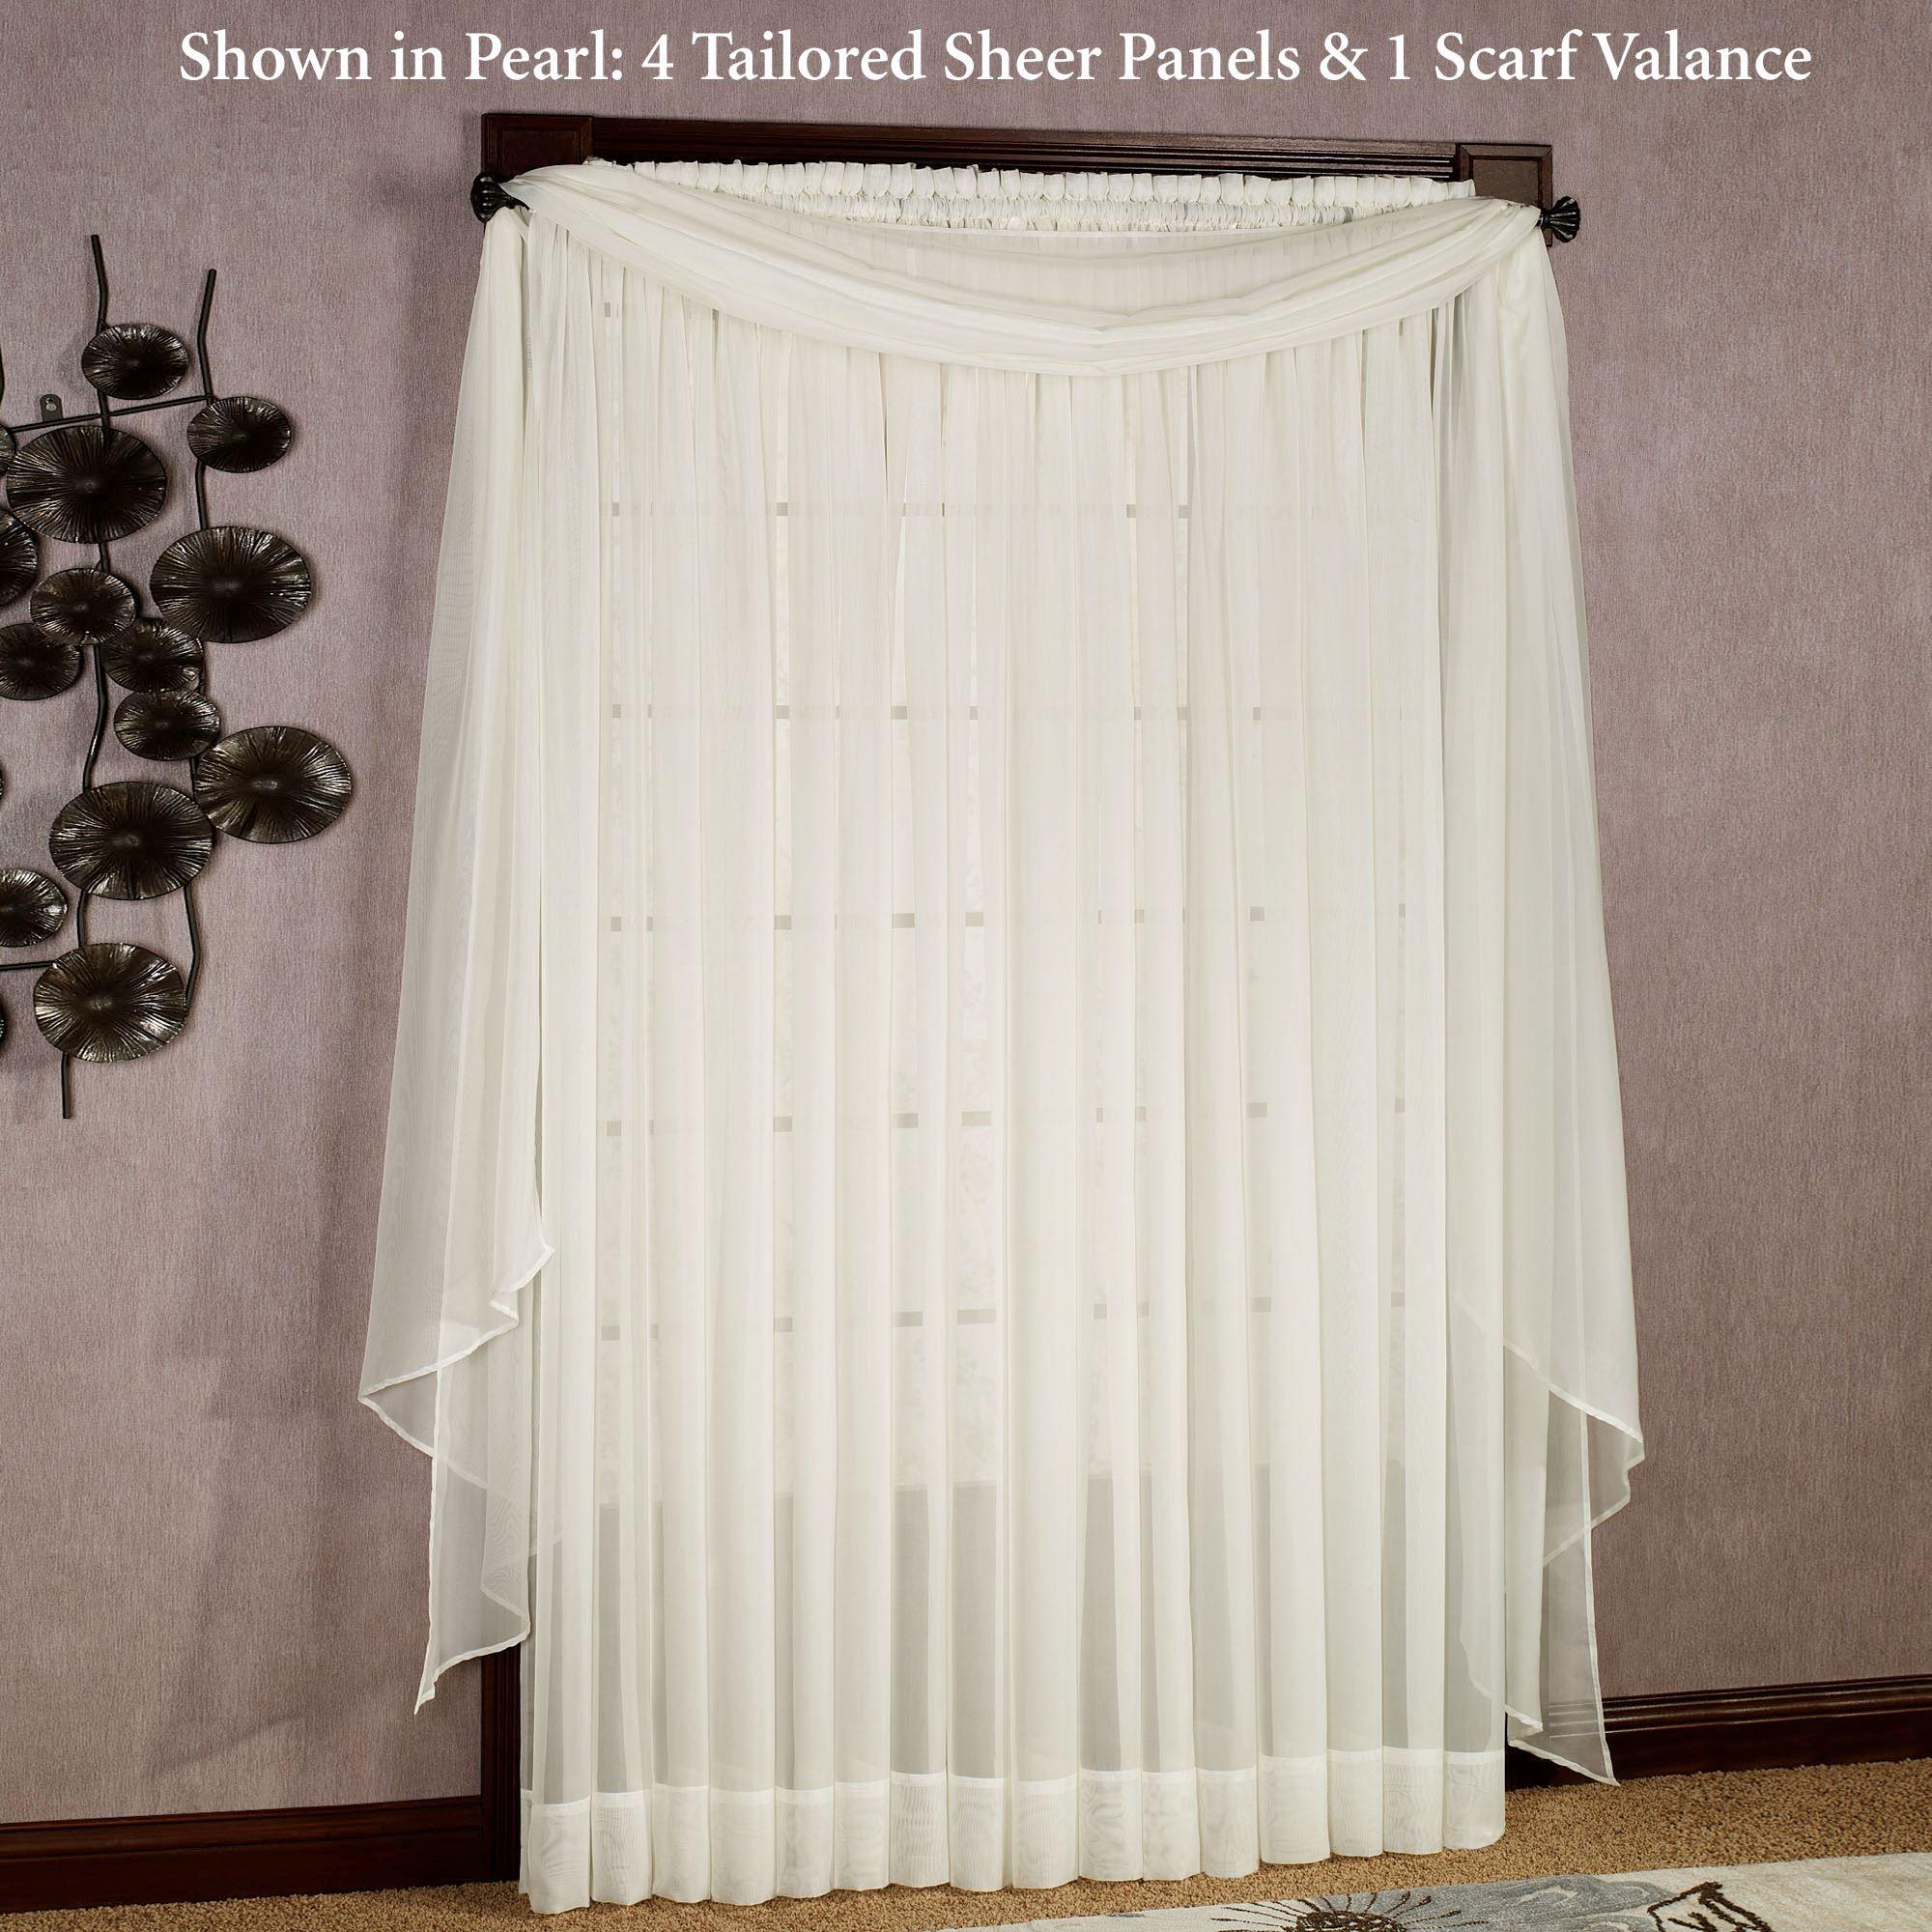 gabrielle curtain drapes pleat inch darkening long curtains pinch p room pair thermal